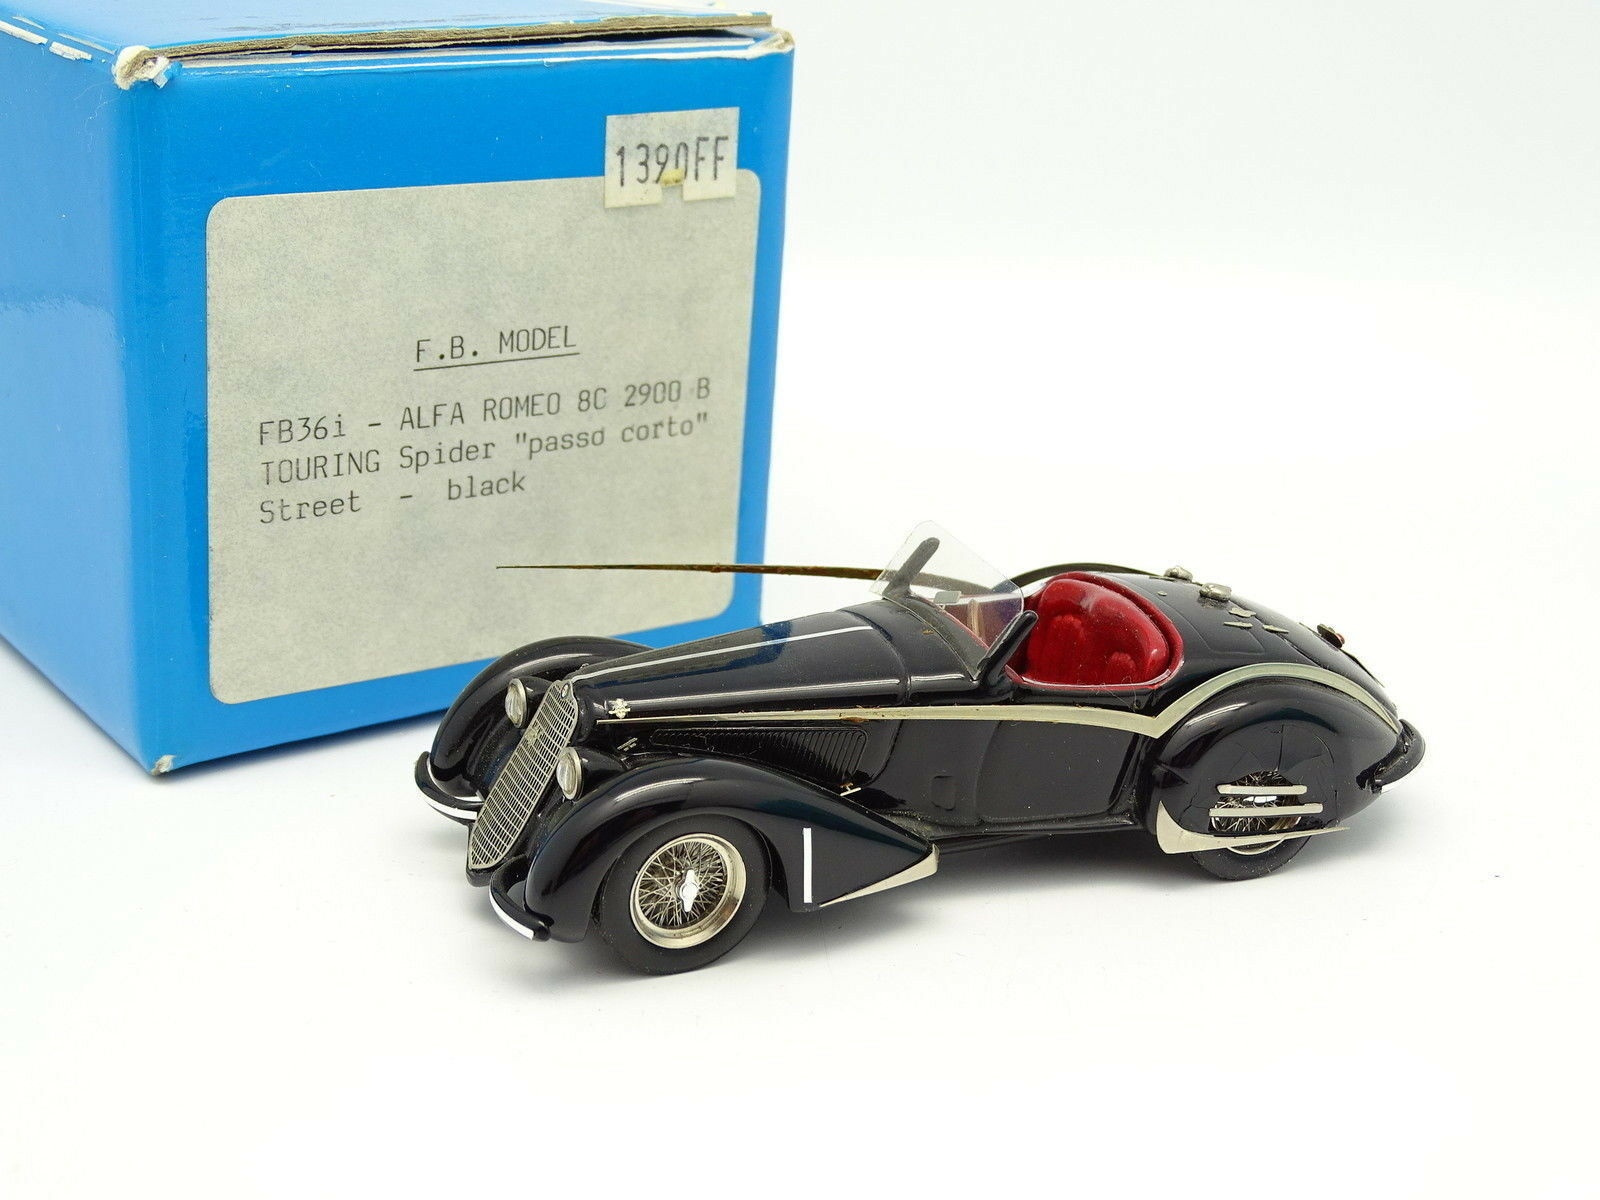 FB Modelo Resina 1 43 - Alfa Romeo 8C 2900 B Touring Spider Passo Corto Negra